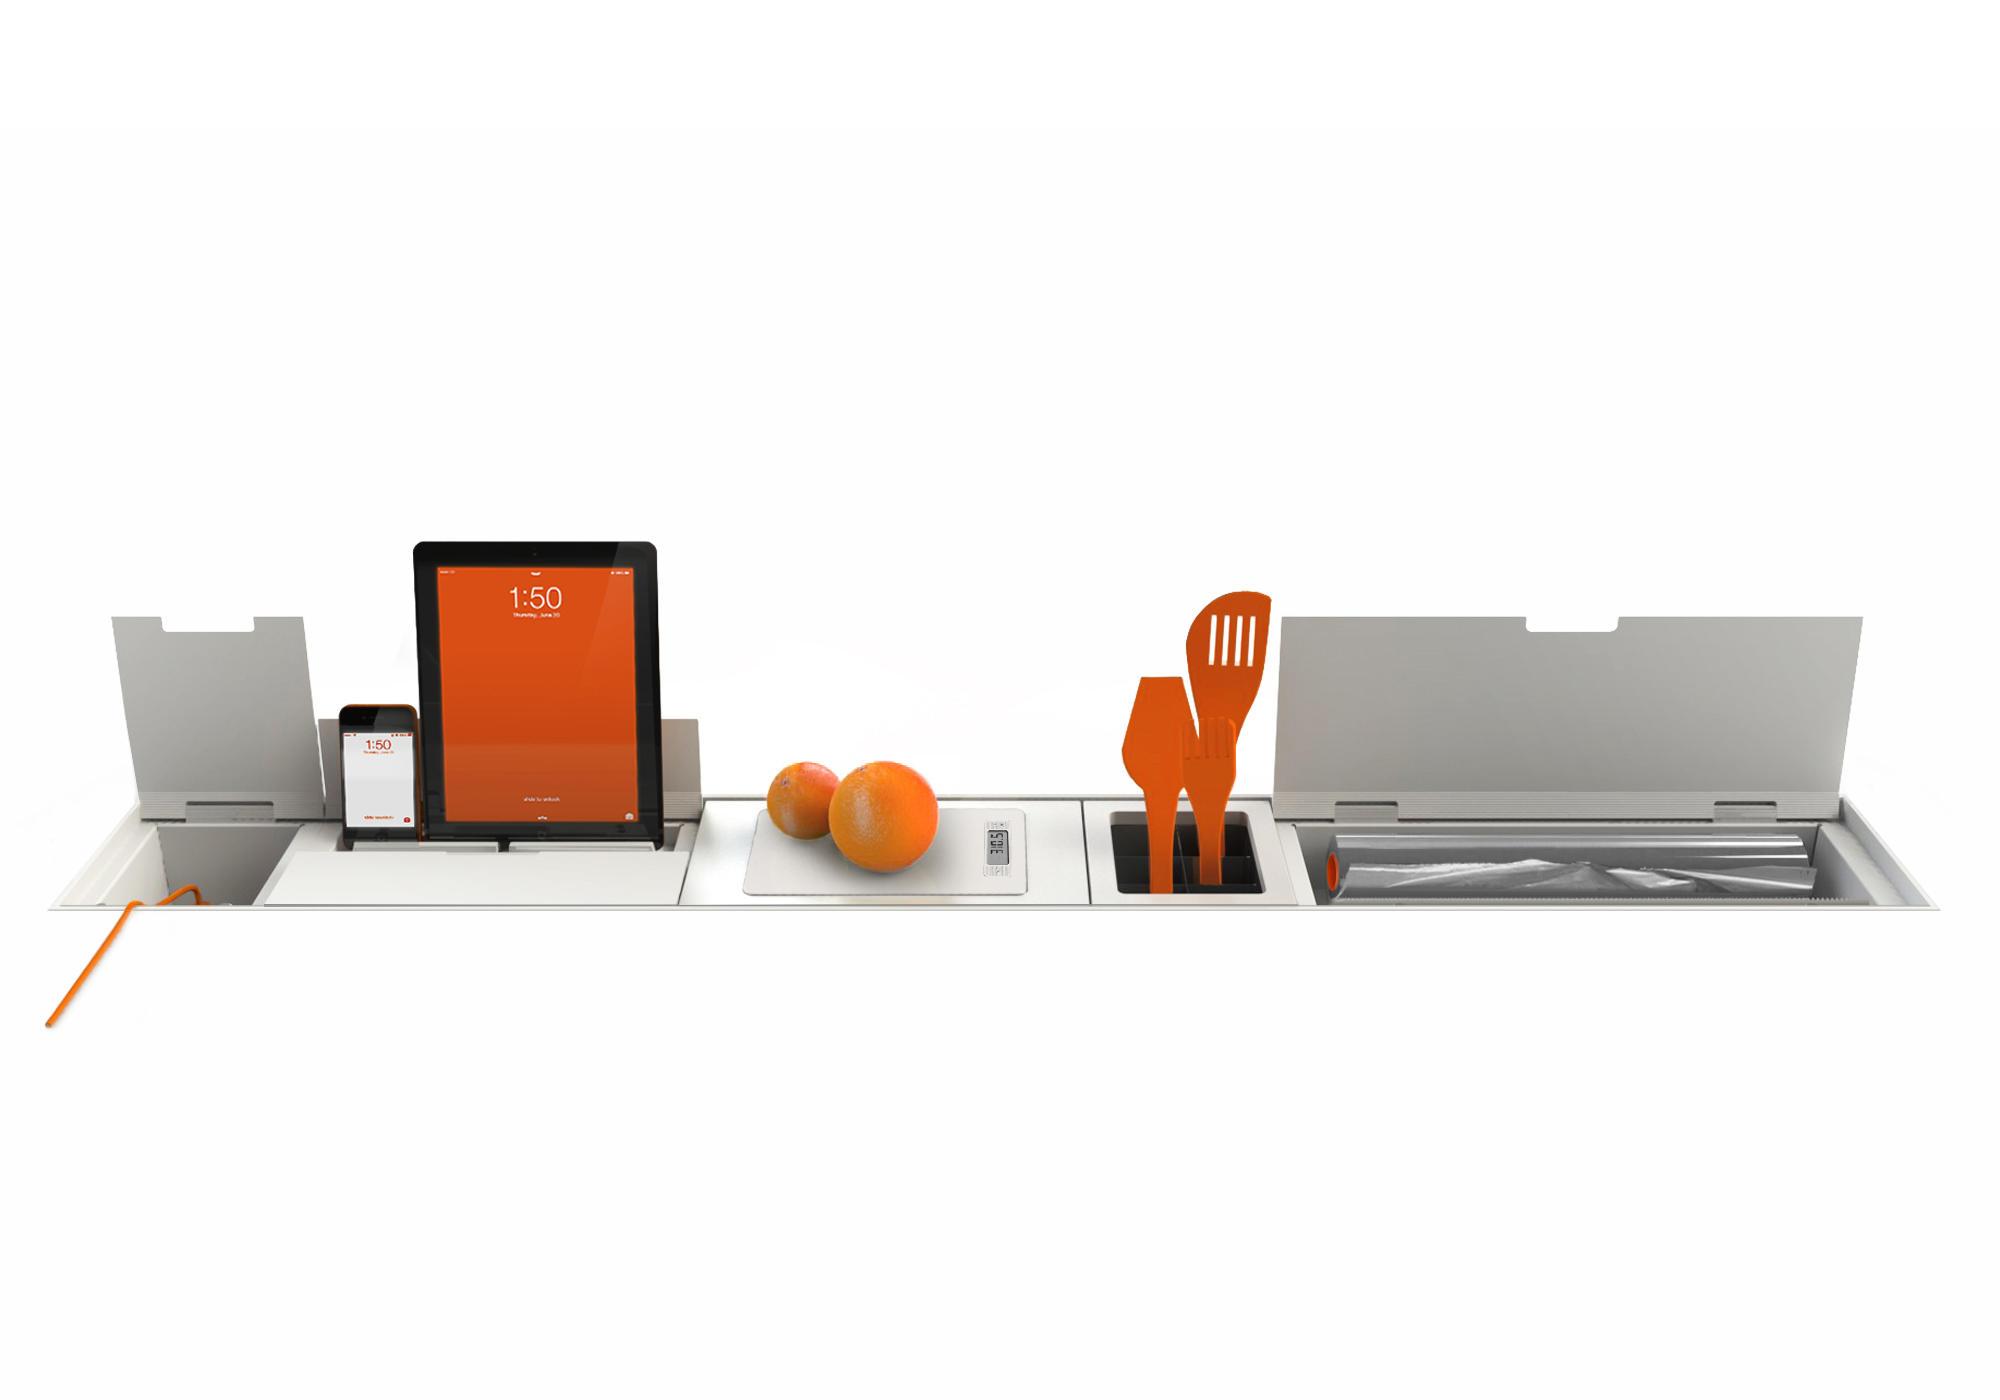 decoma design product design on architonic